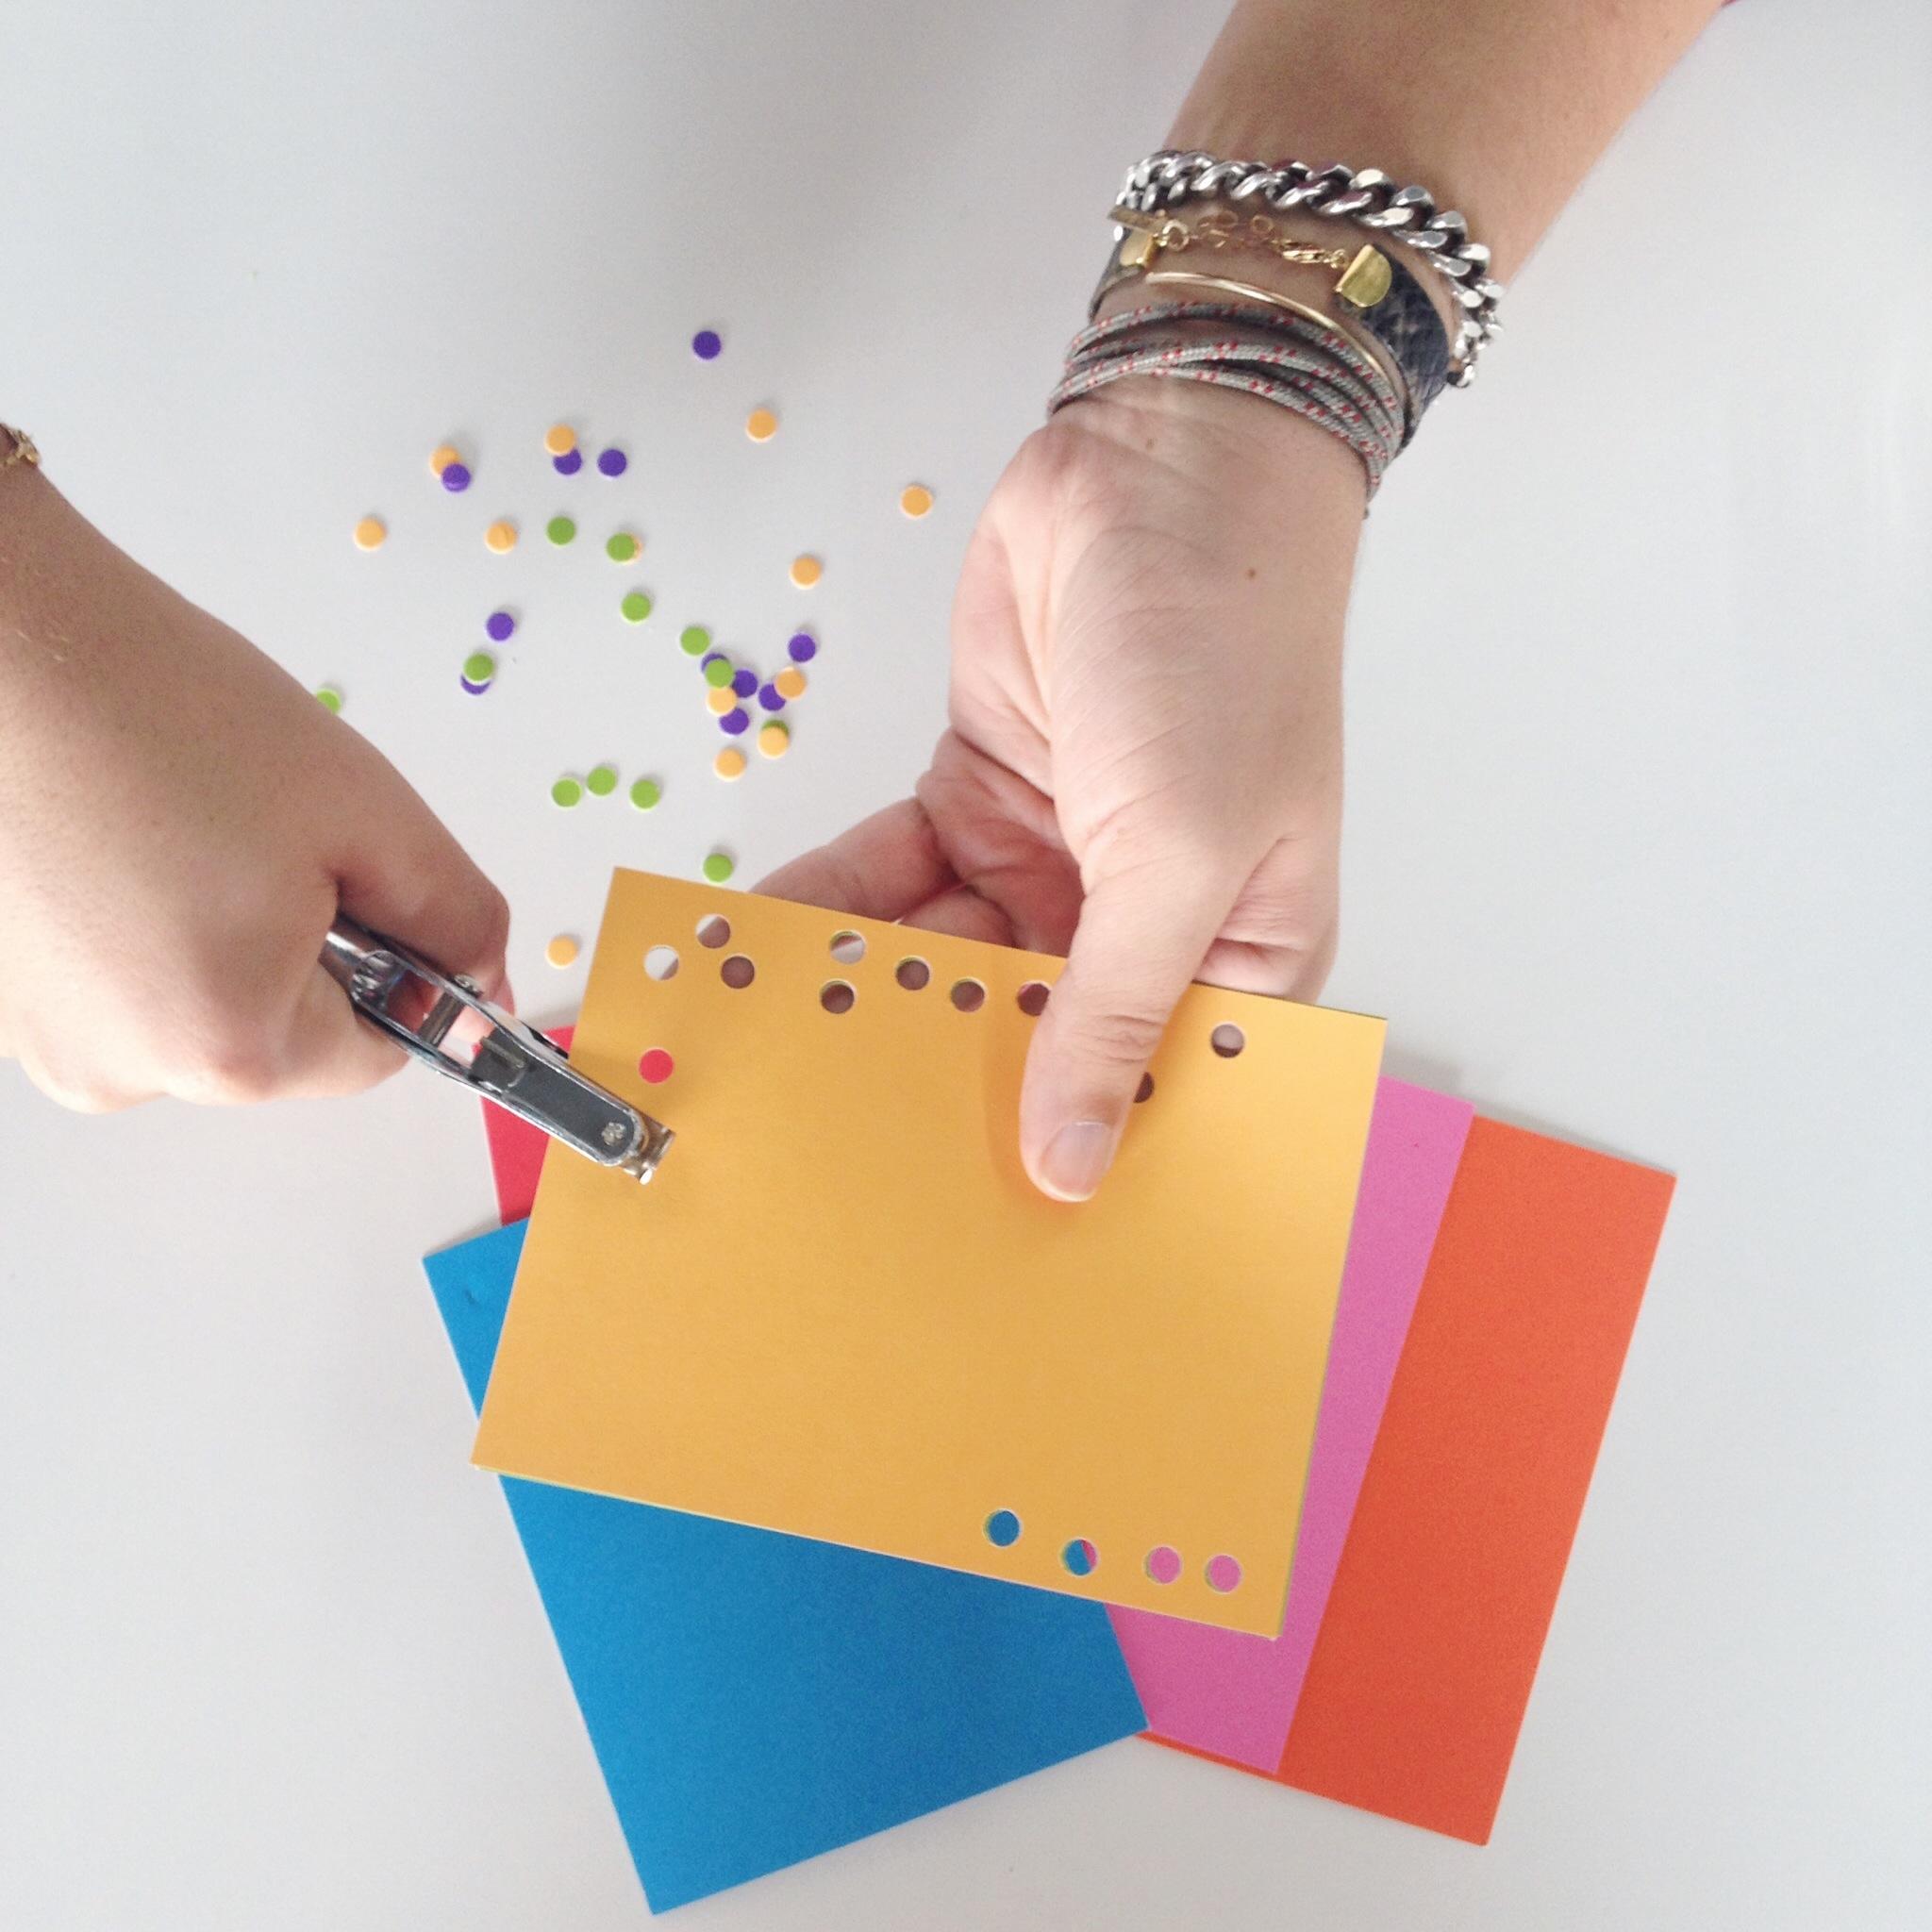 making-confetti2.jpg